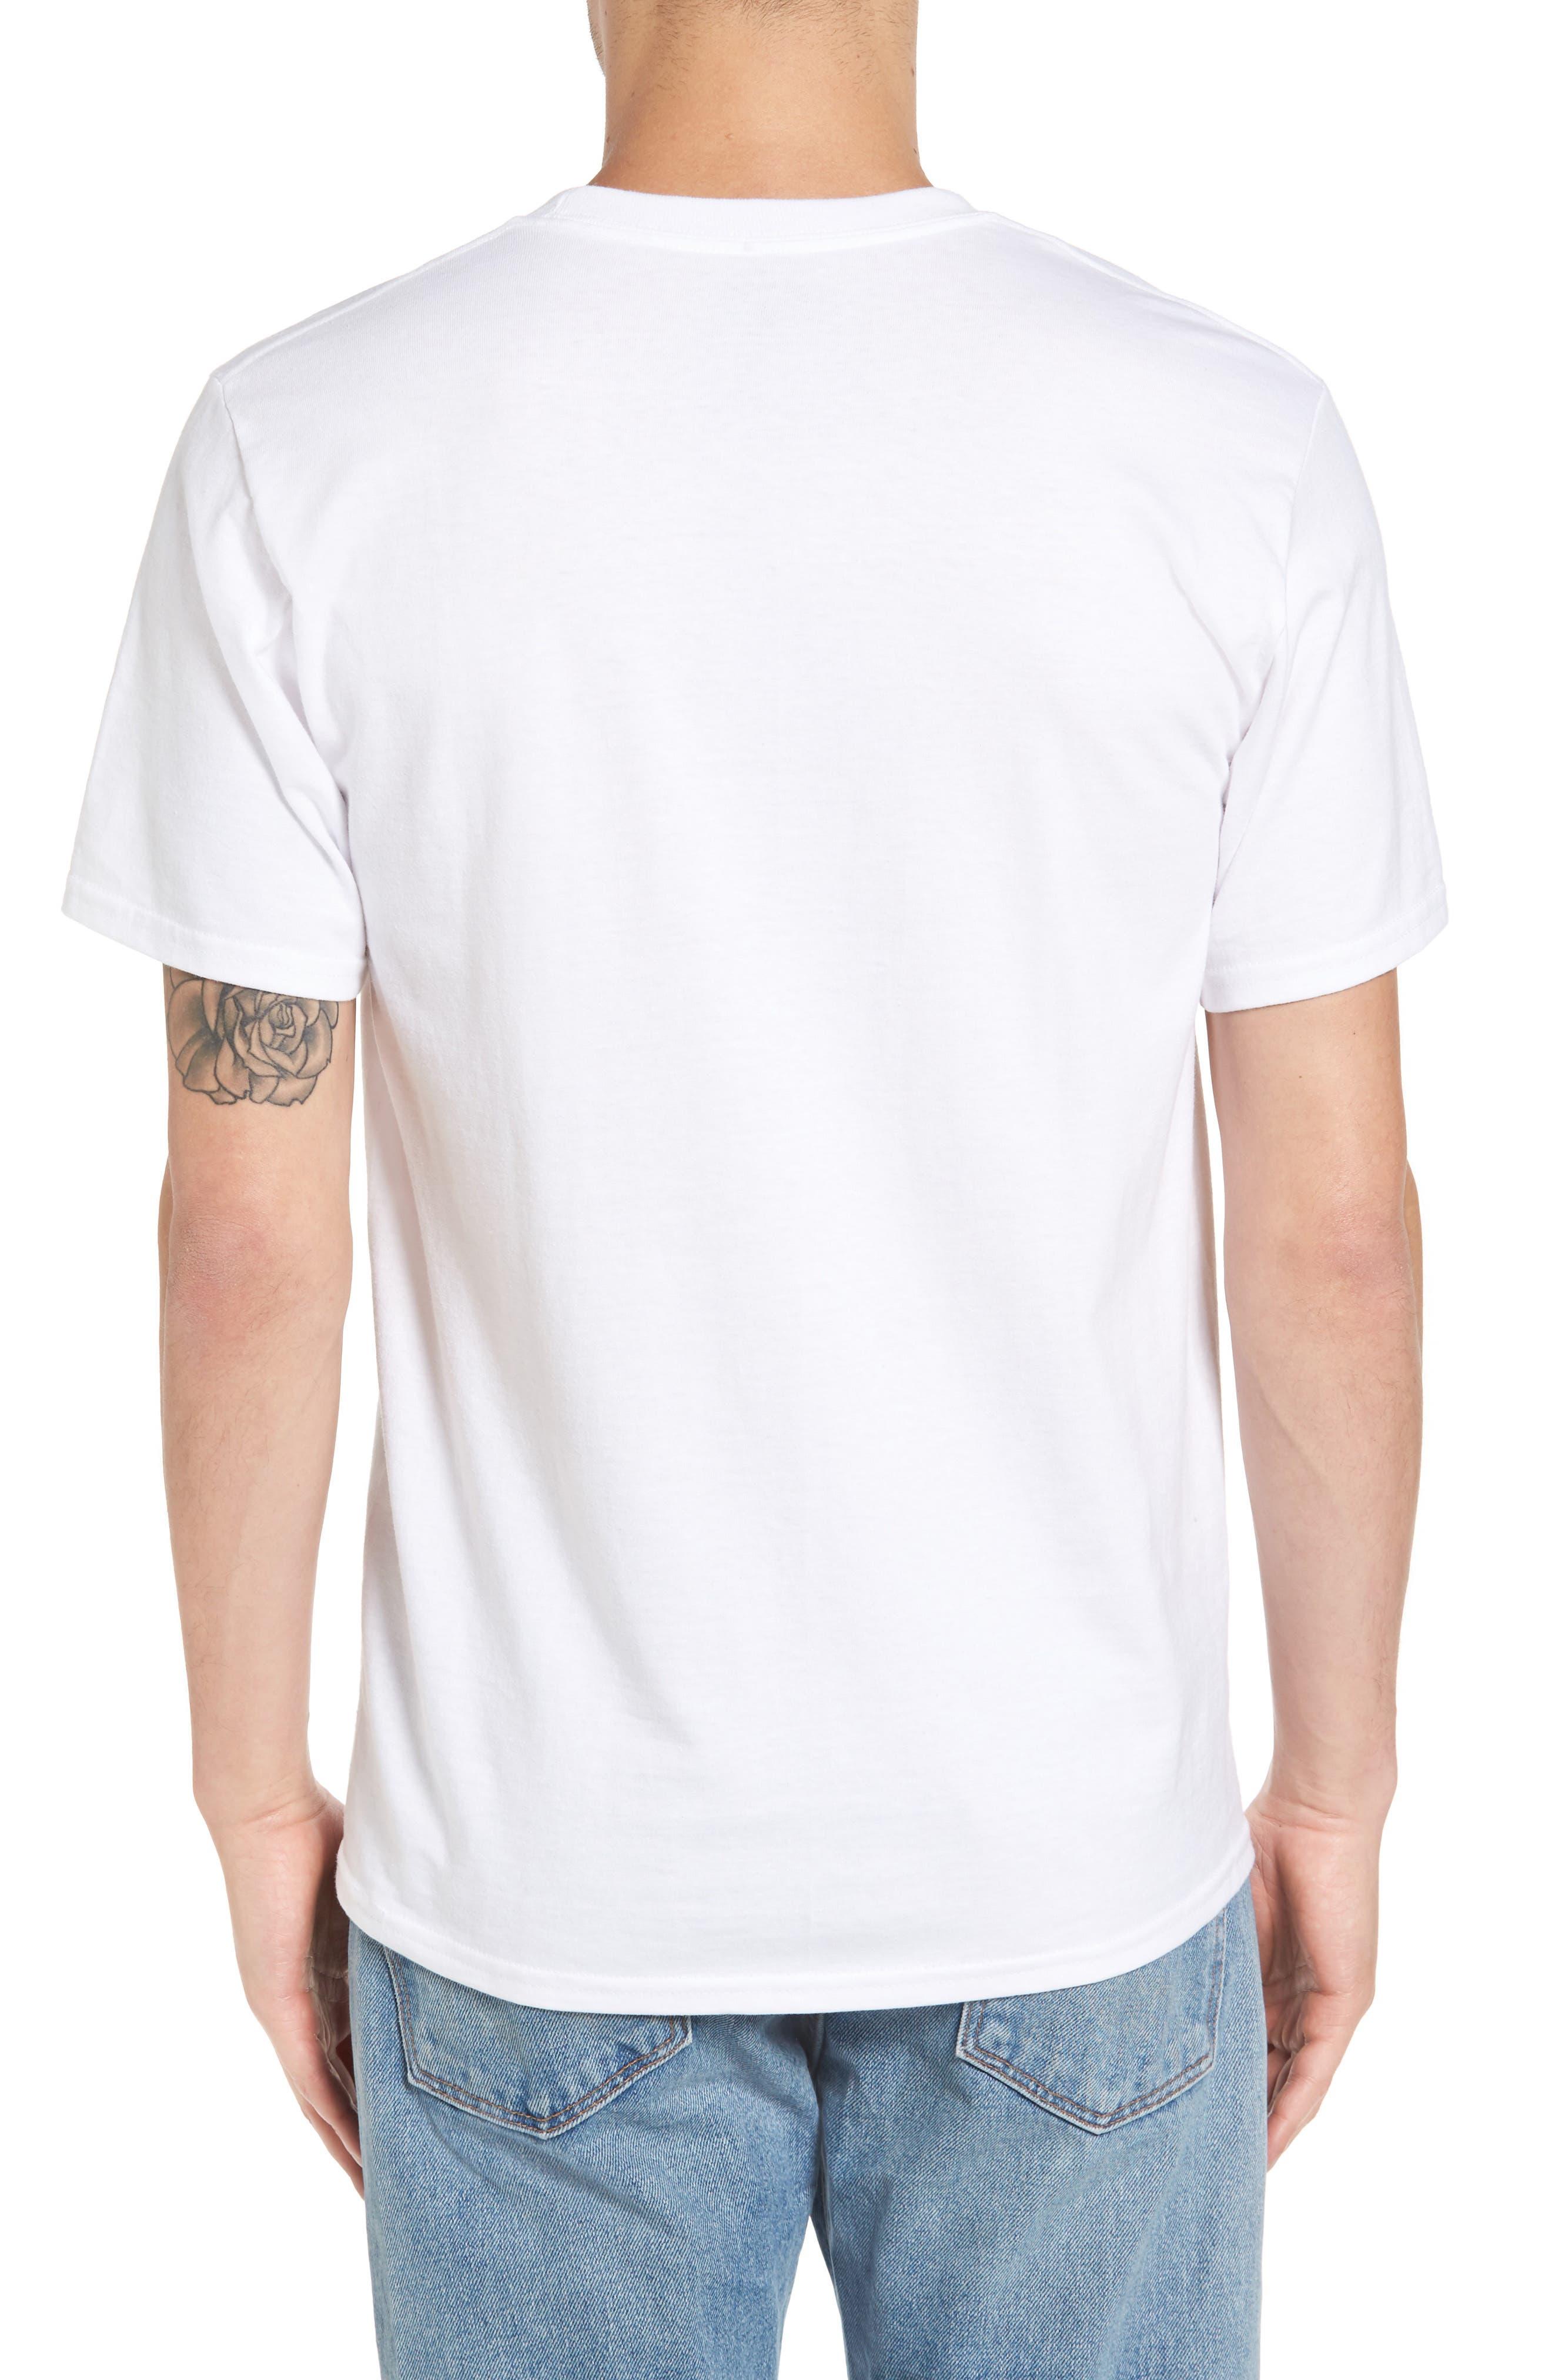 USA Graphic T-Shirt,                             Alternate thumbnail 10, color,